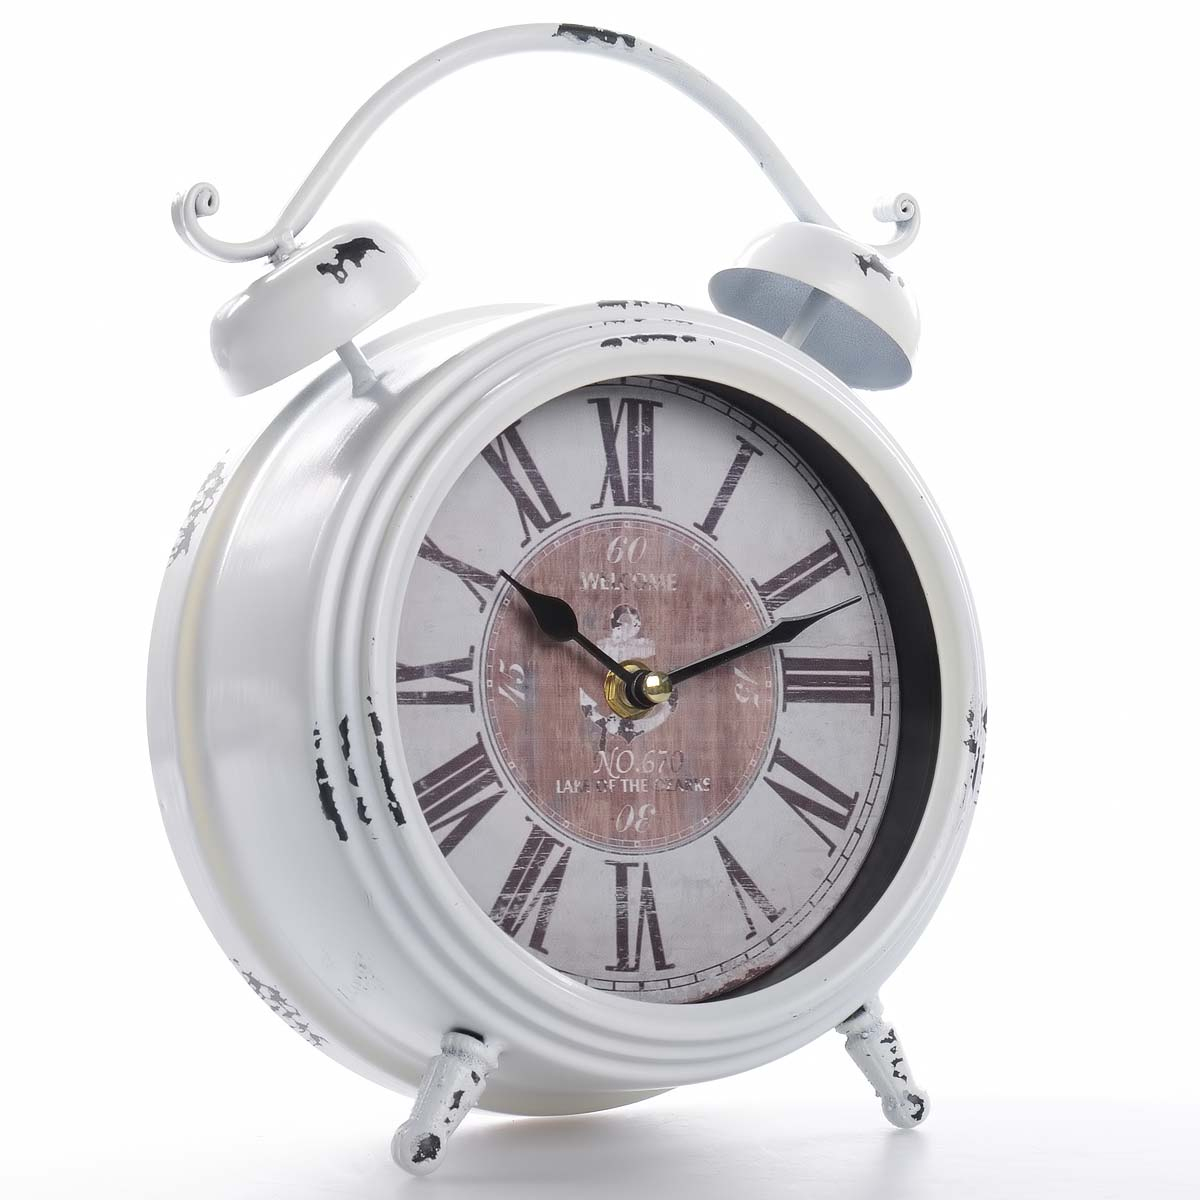 Vintage χειροποίητο διακοσμητικό ρολόι μεταλλικό - OEM 51534